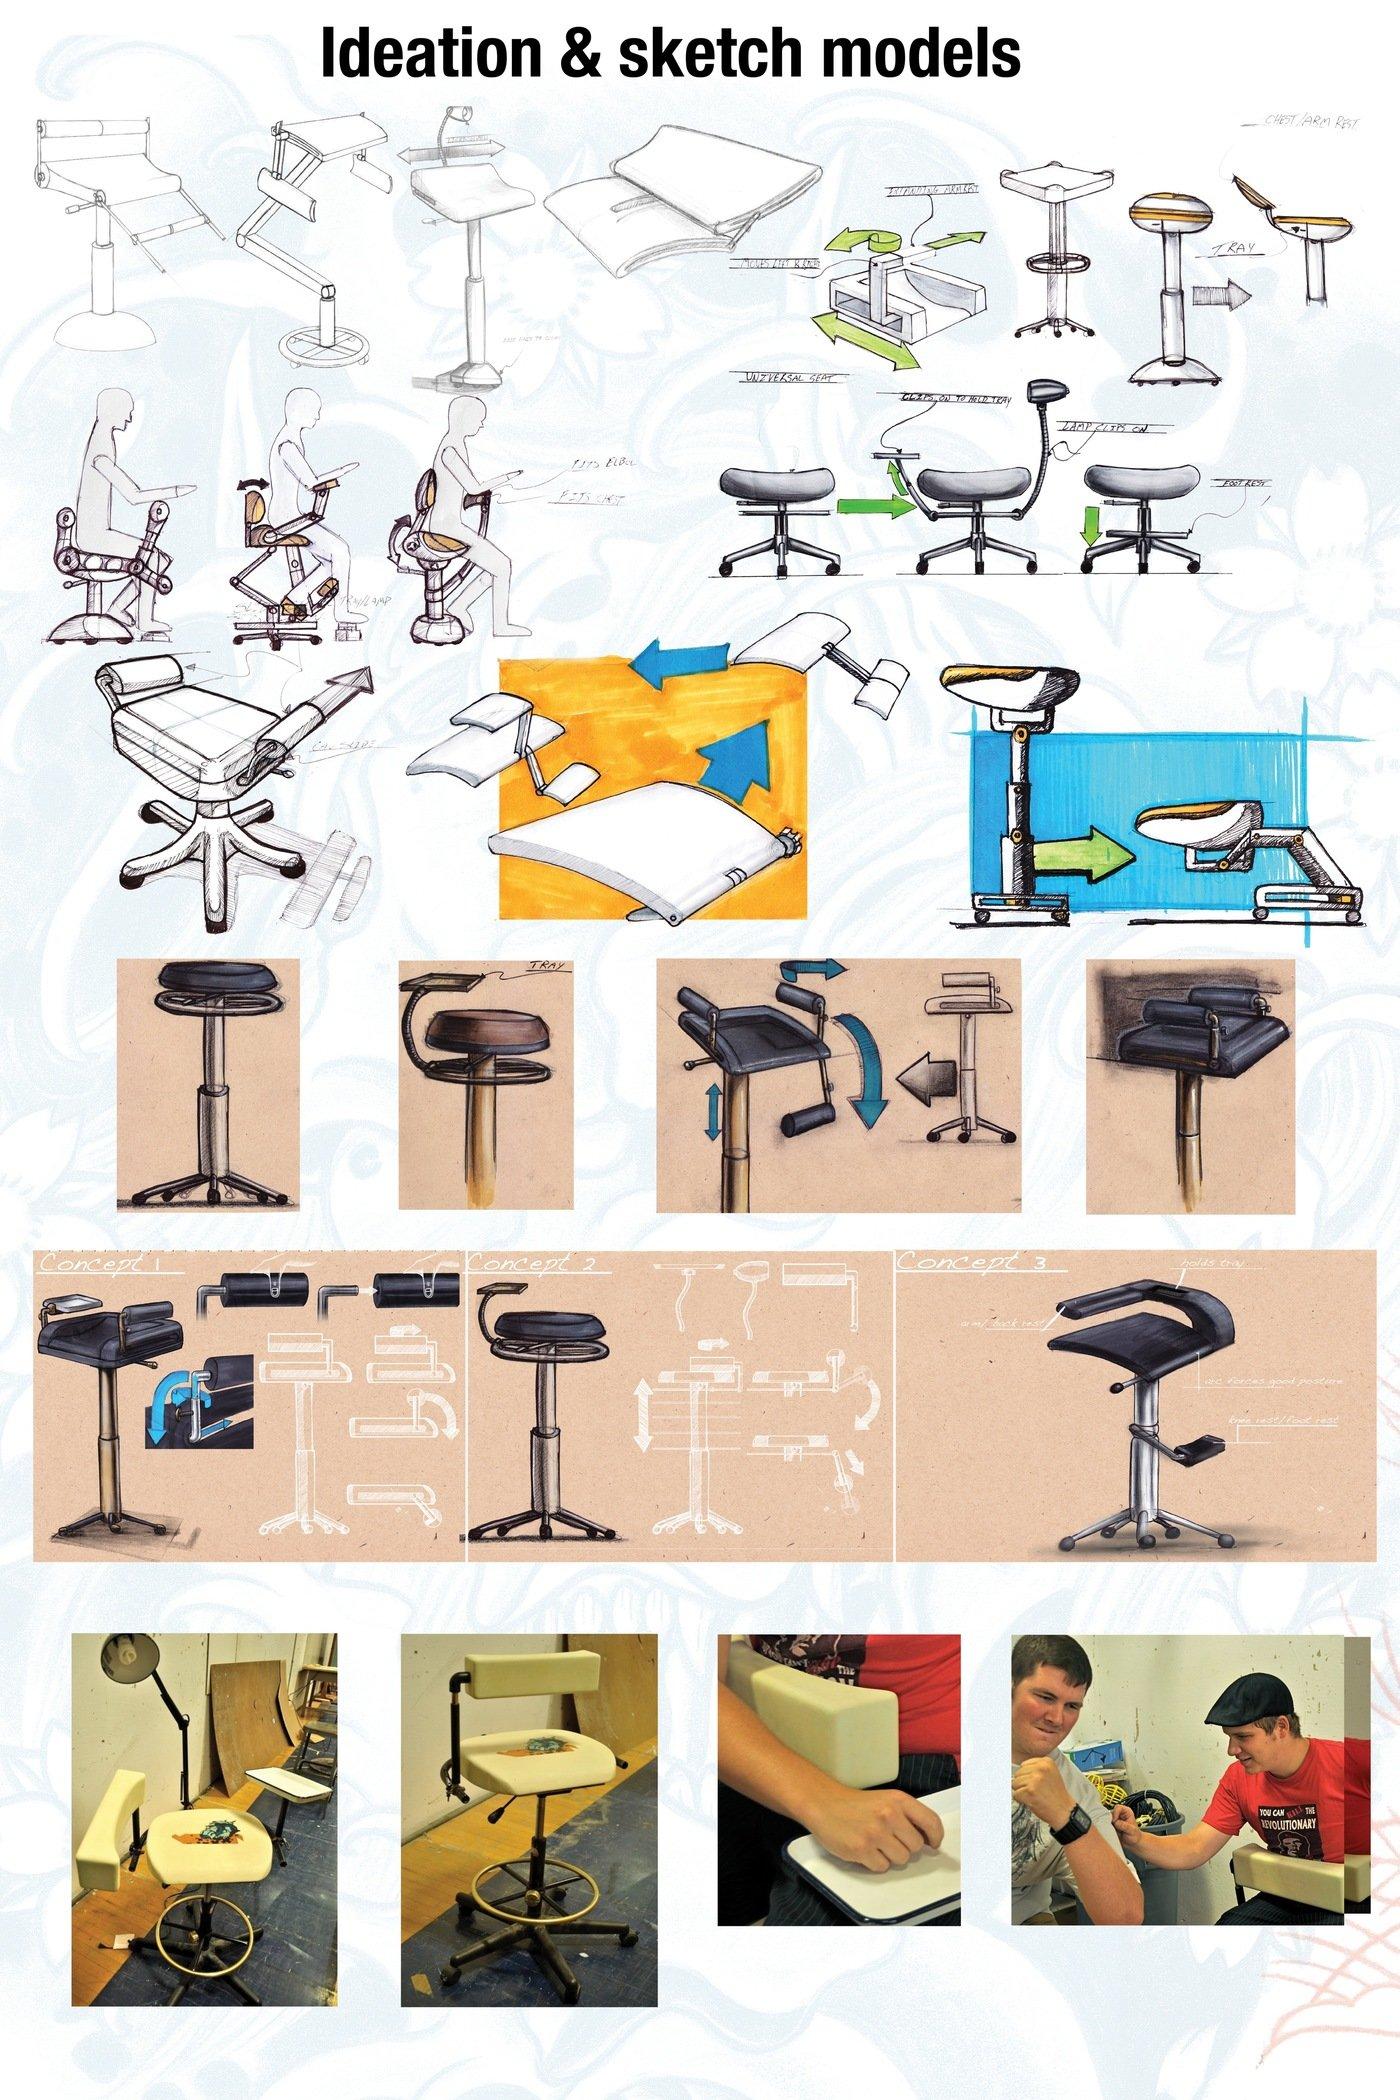 tattoo artist chair fisher price laugh learn ergonomic by jason burnell at coroflot